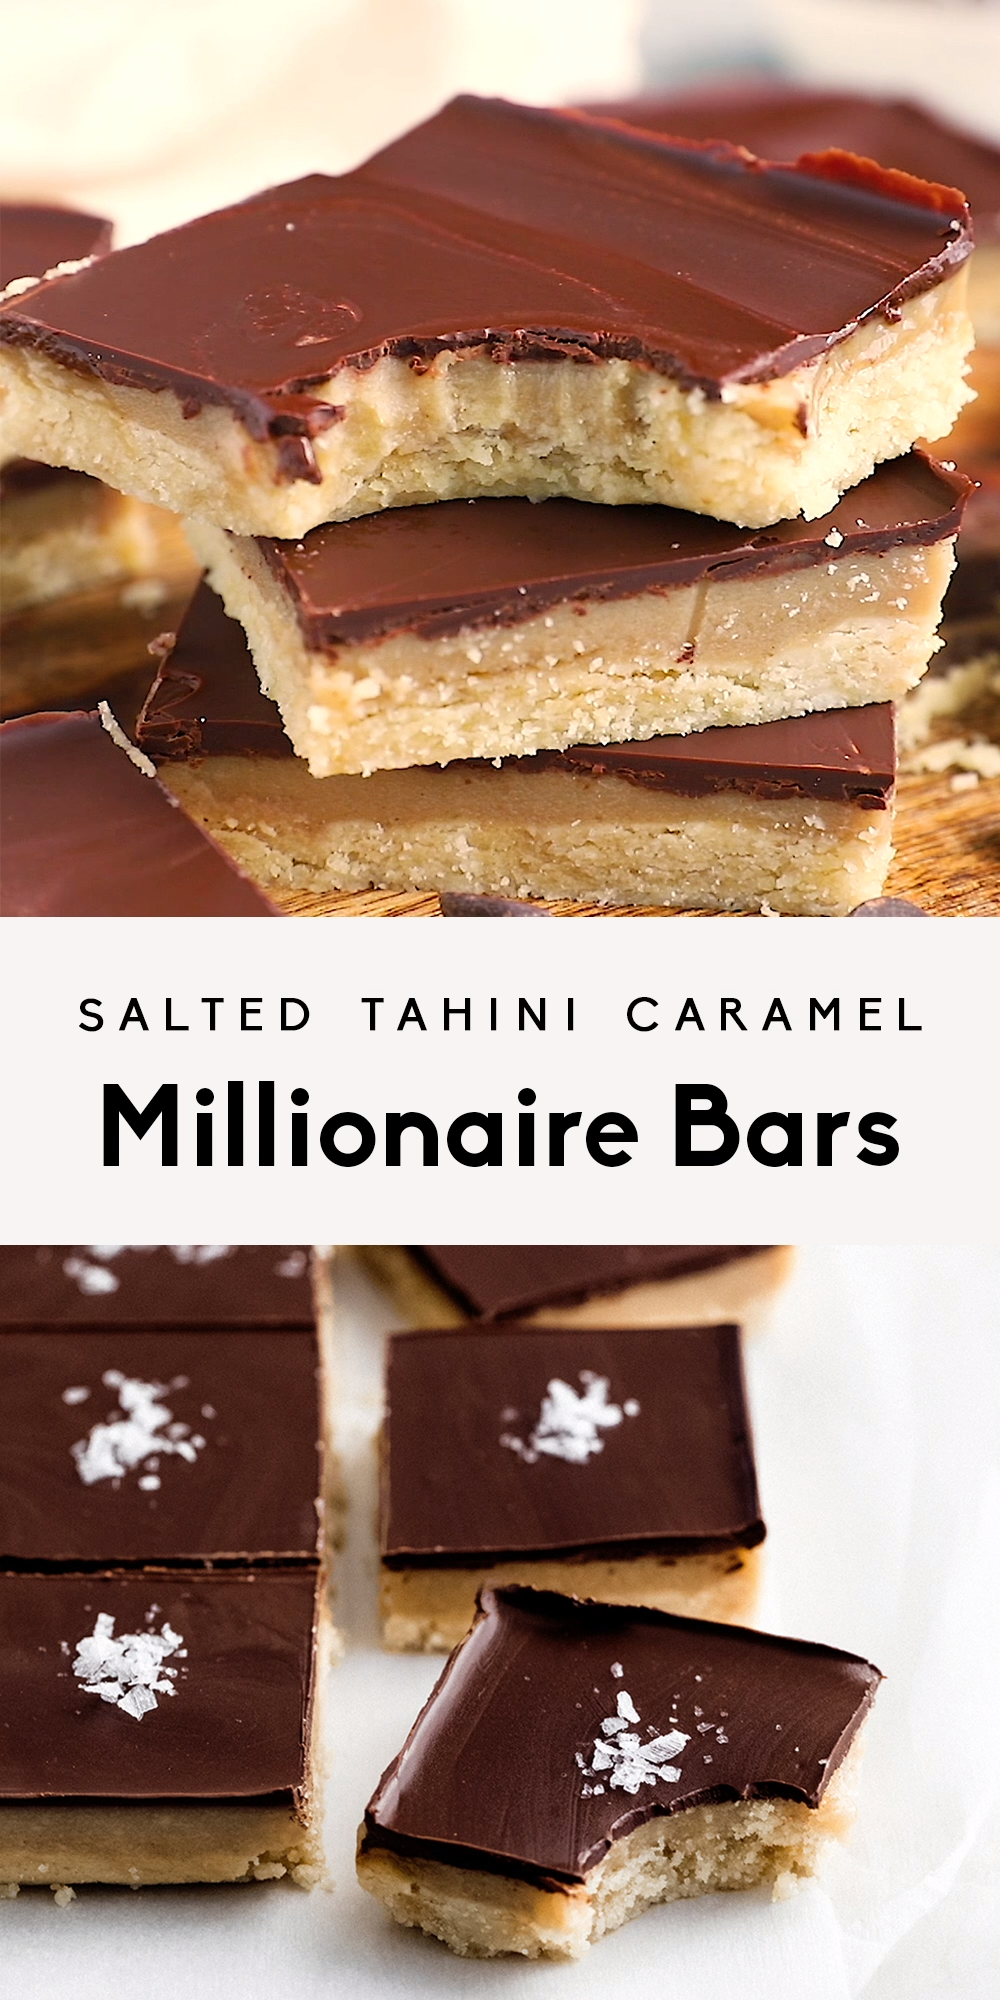 Salted Tahini Caramel Millionaire Bars (vegan + paleo)